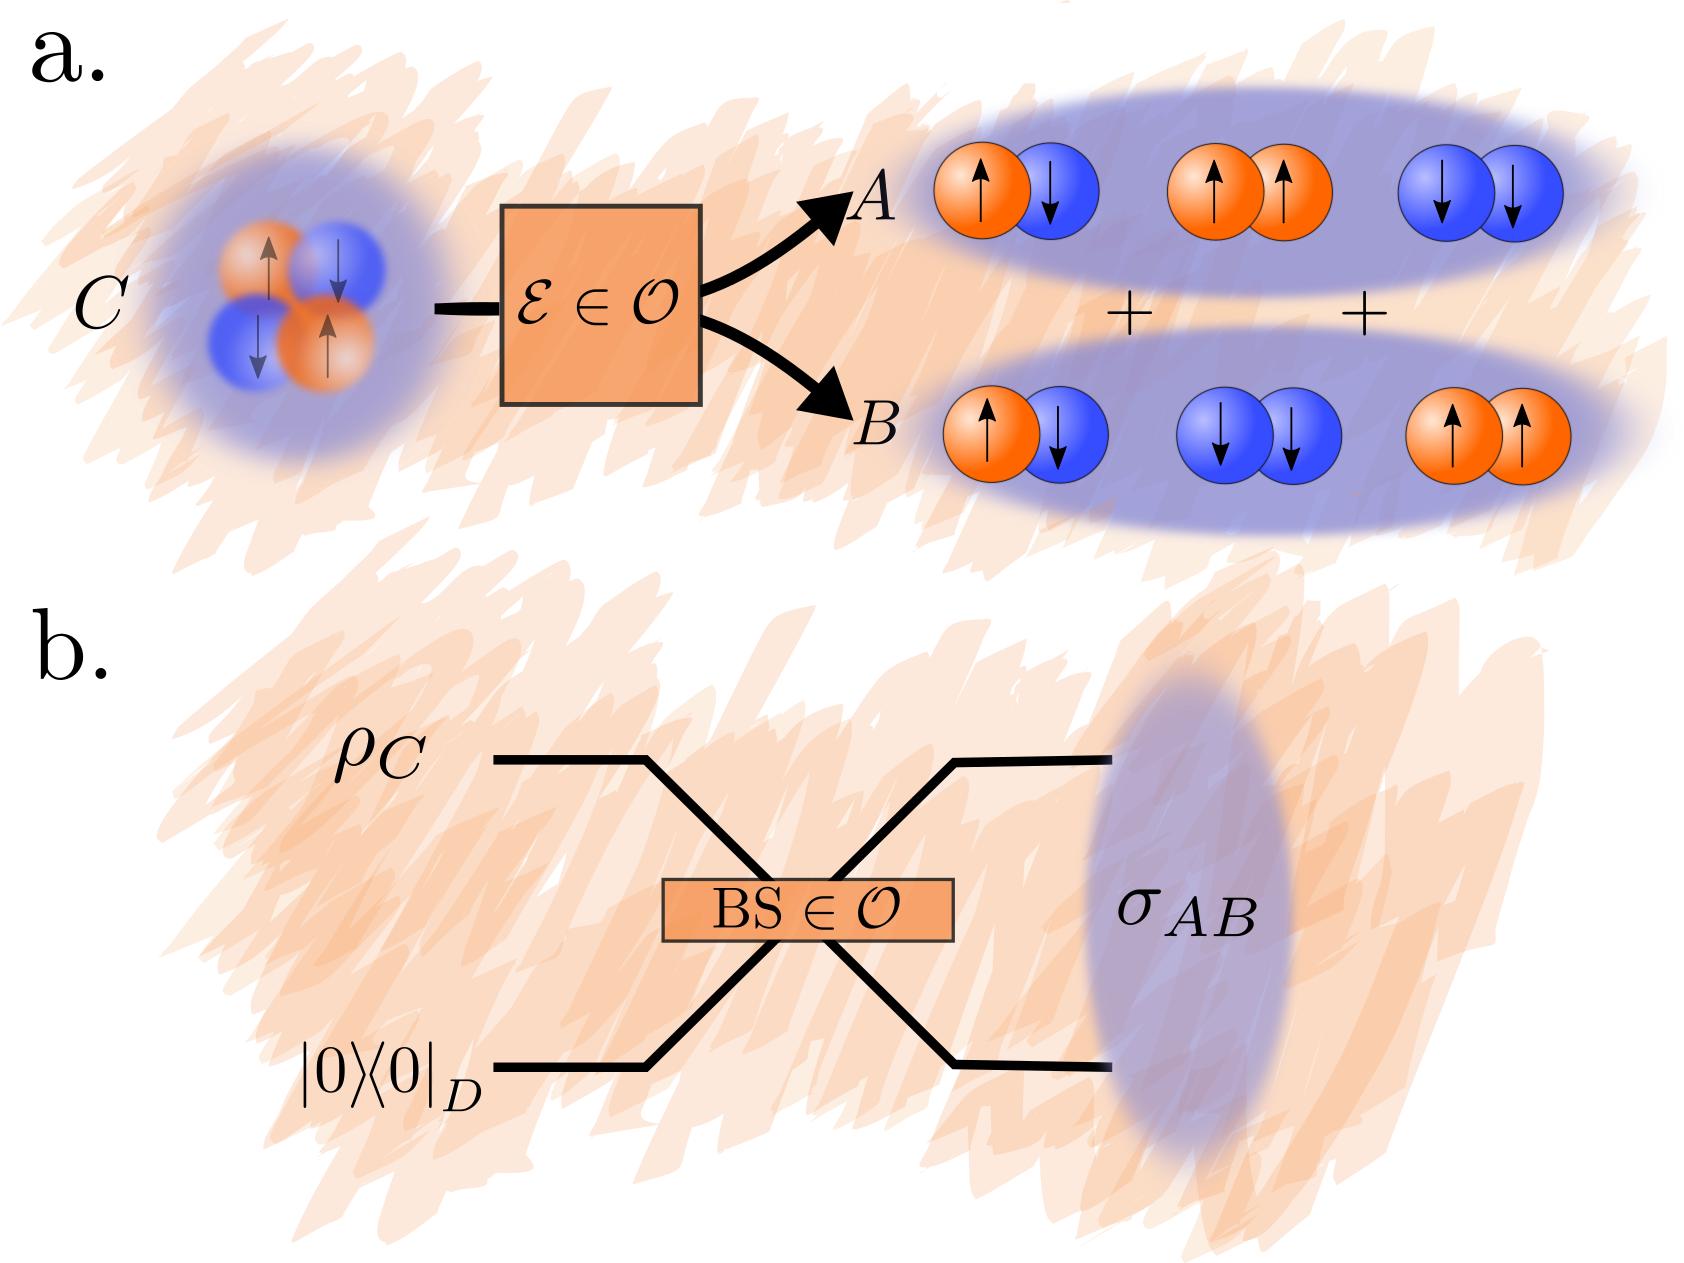 a. Conversion protocol between PE and SSR-entanglement via the quantum operation